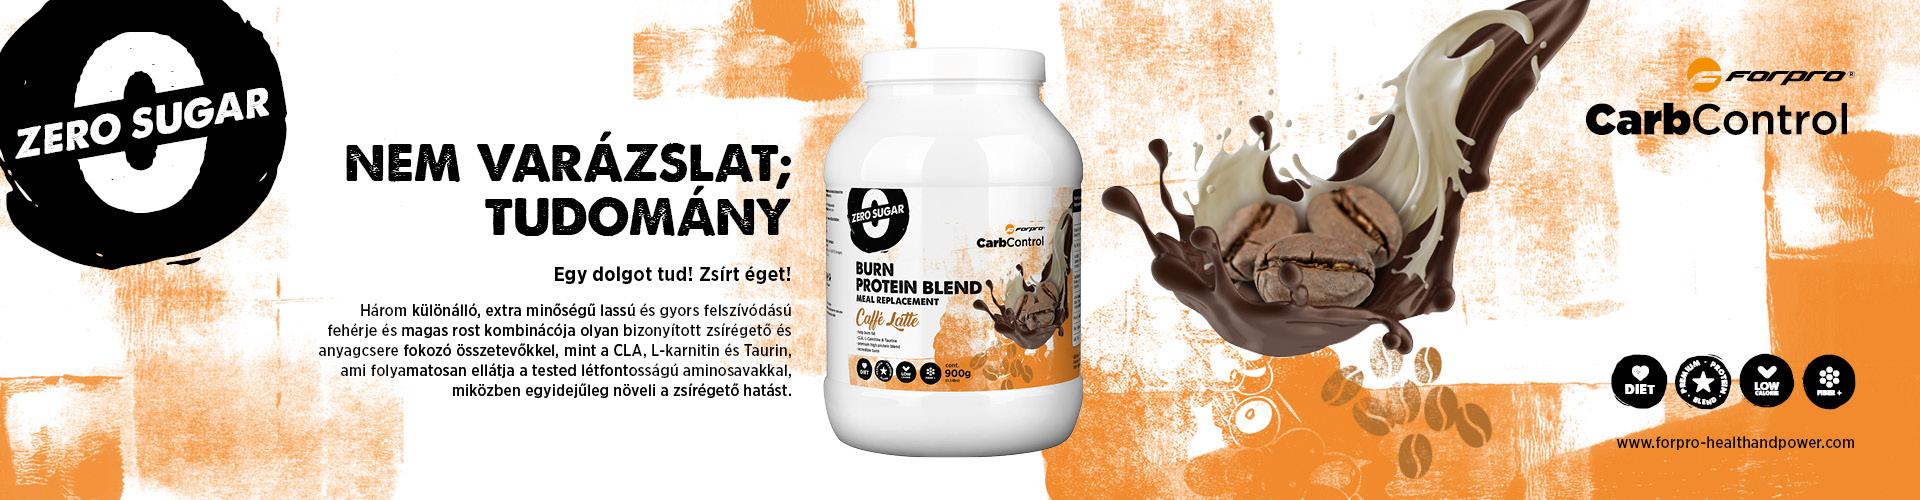 http://www.sport8nagyker.hu/ForPro-Burn-Protein-Blend-900g-Double-Chocolate